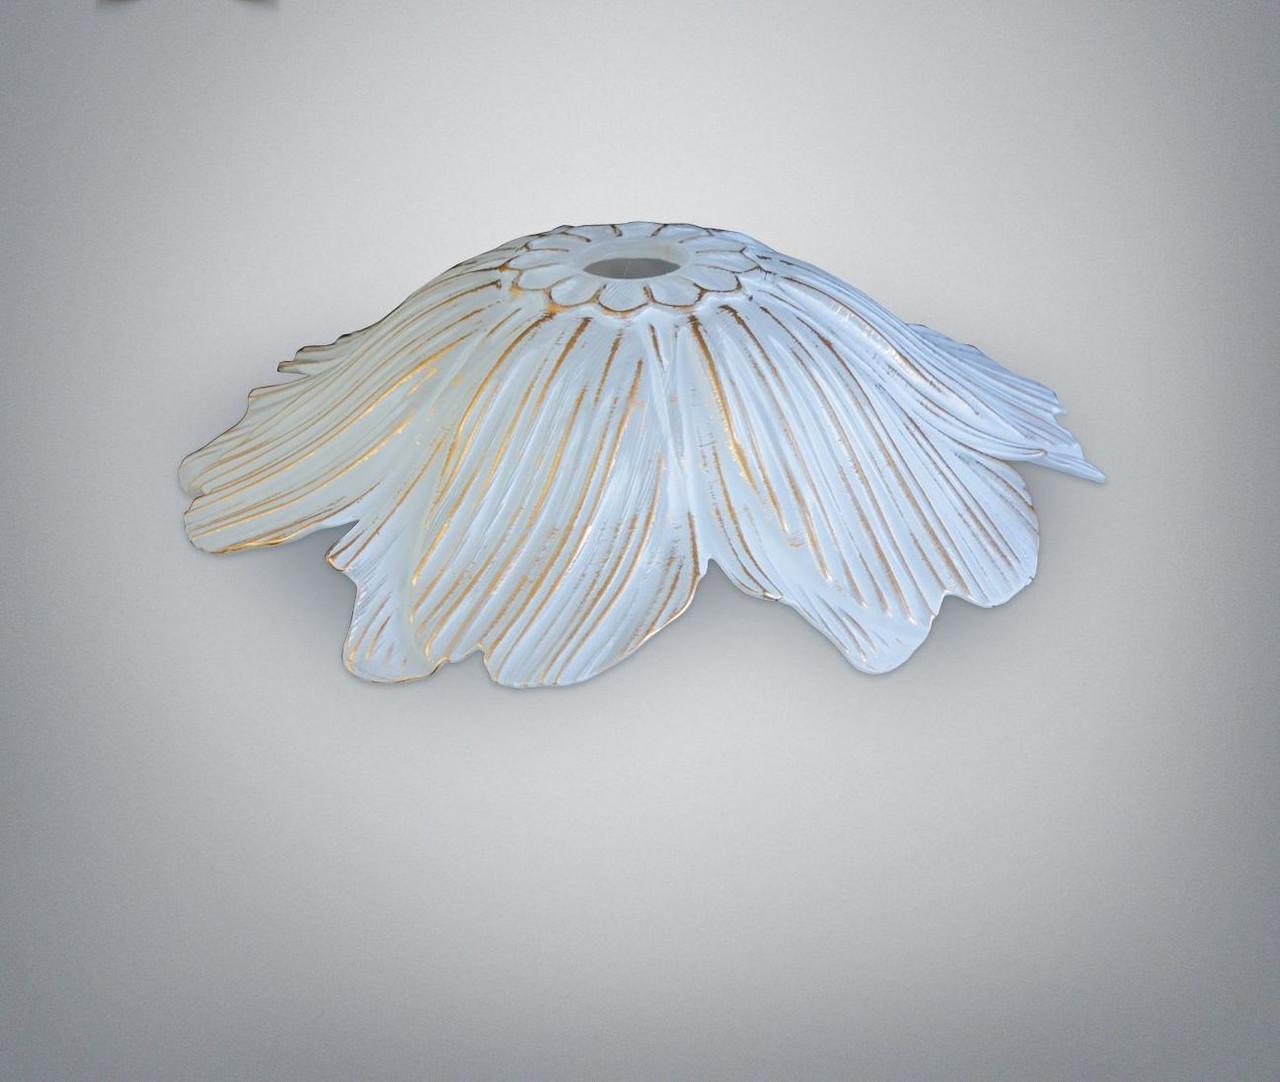 Плафон эволюзион белый-золото , цоколь Е27